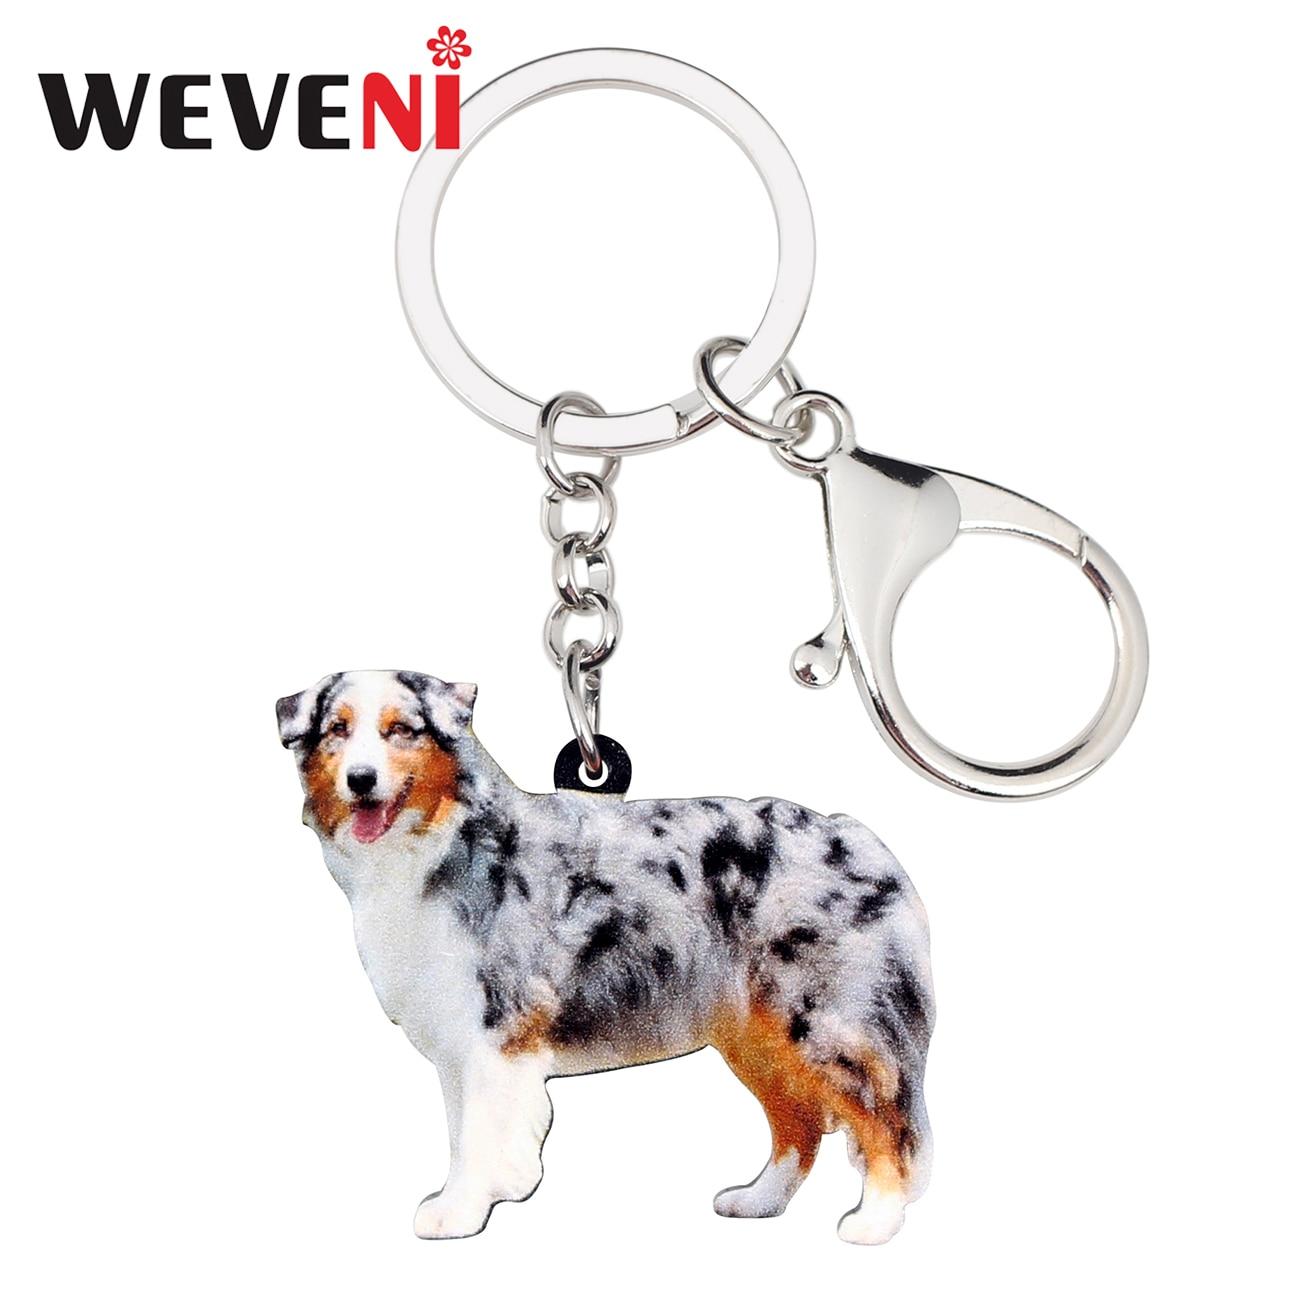 WEVENI Acrylic Australian Shepherd Dog Key Chains Keychains Holder Animal Jewelry For Women Girls Bag Car Wallet Charms Pendant